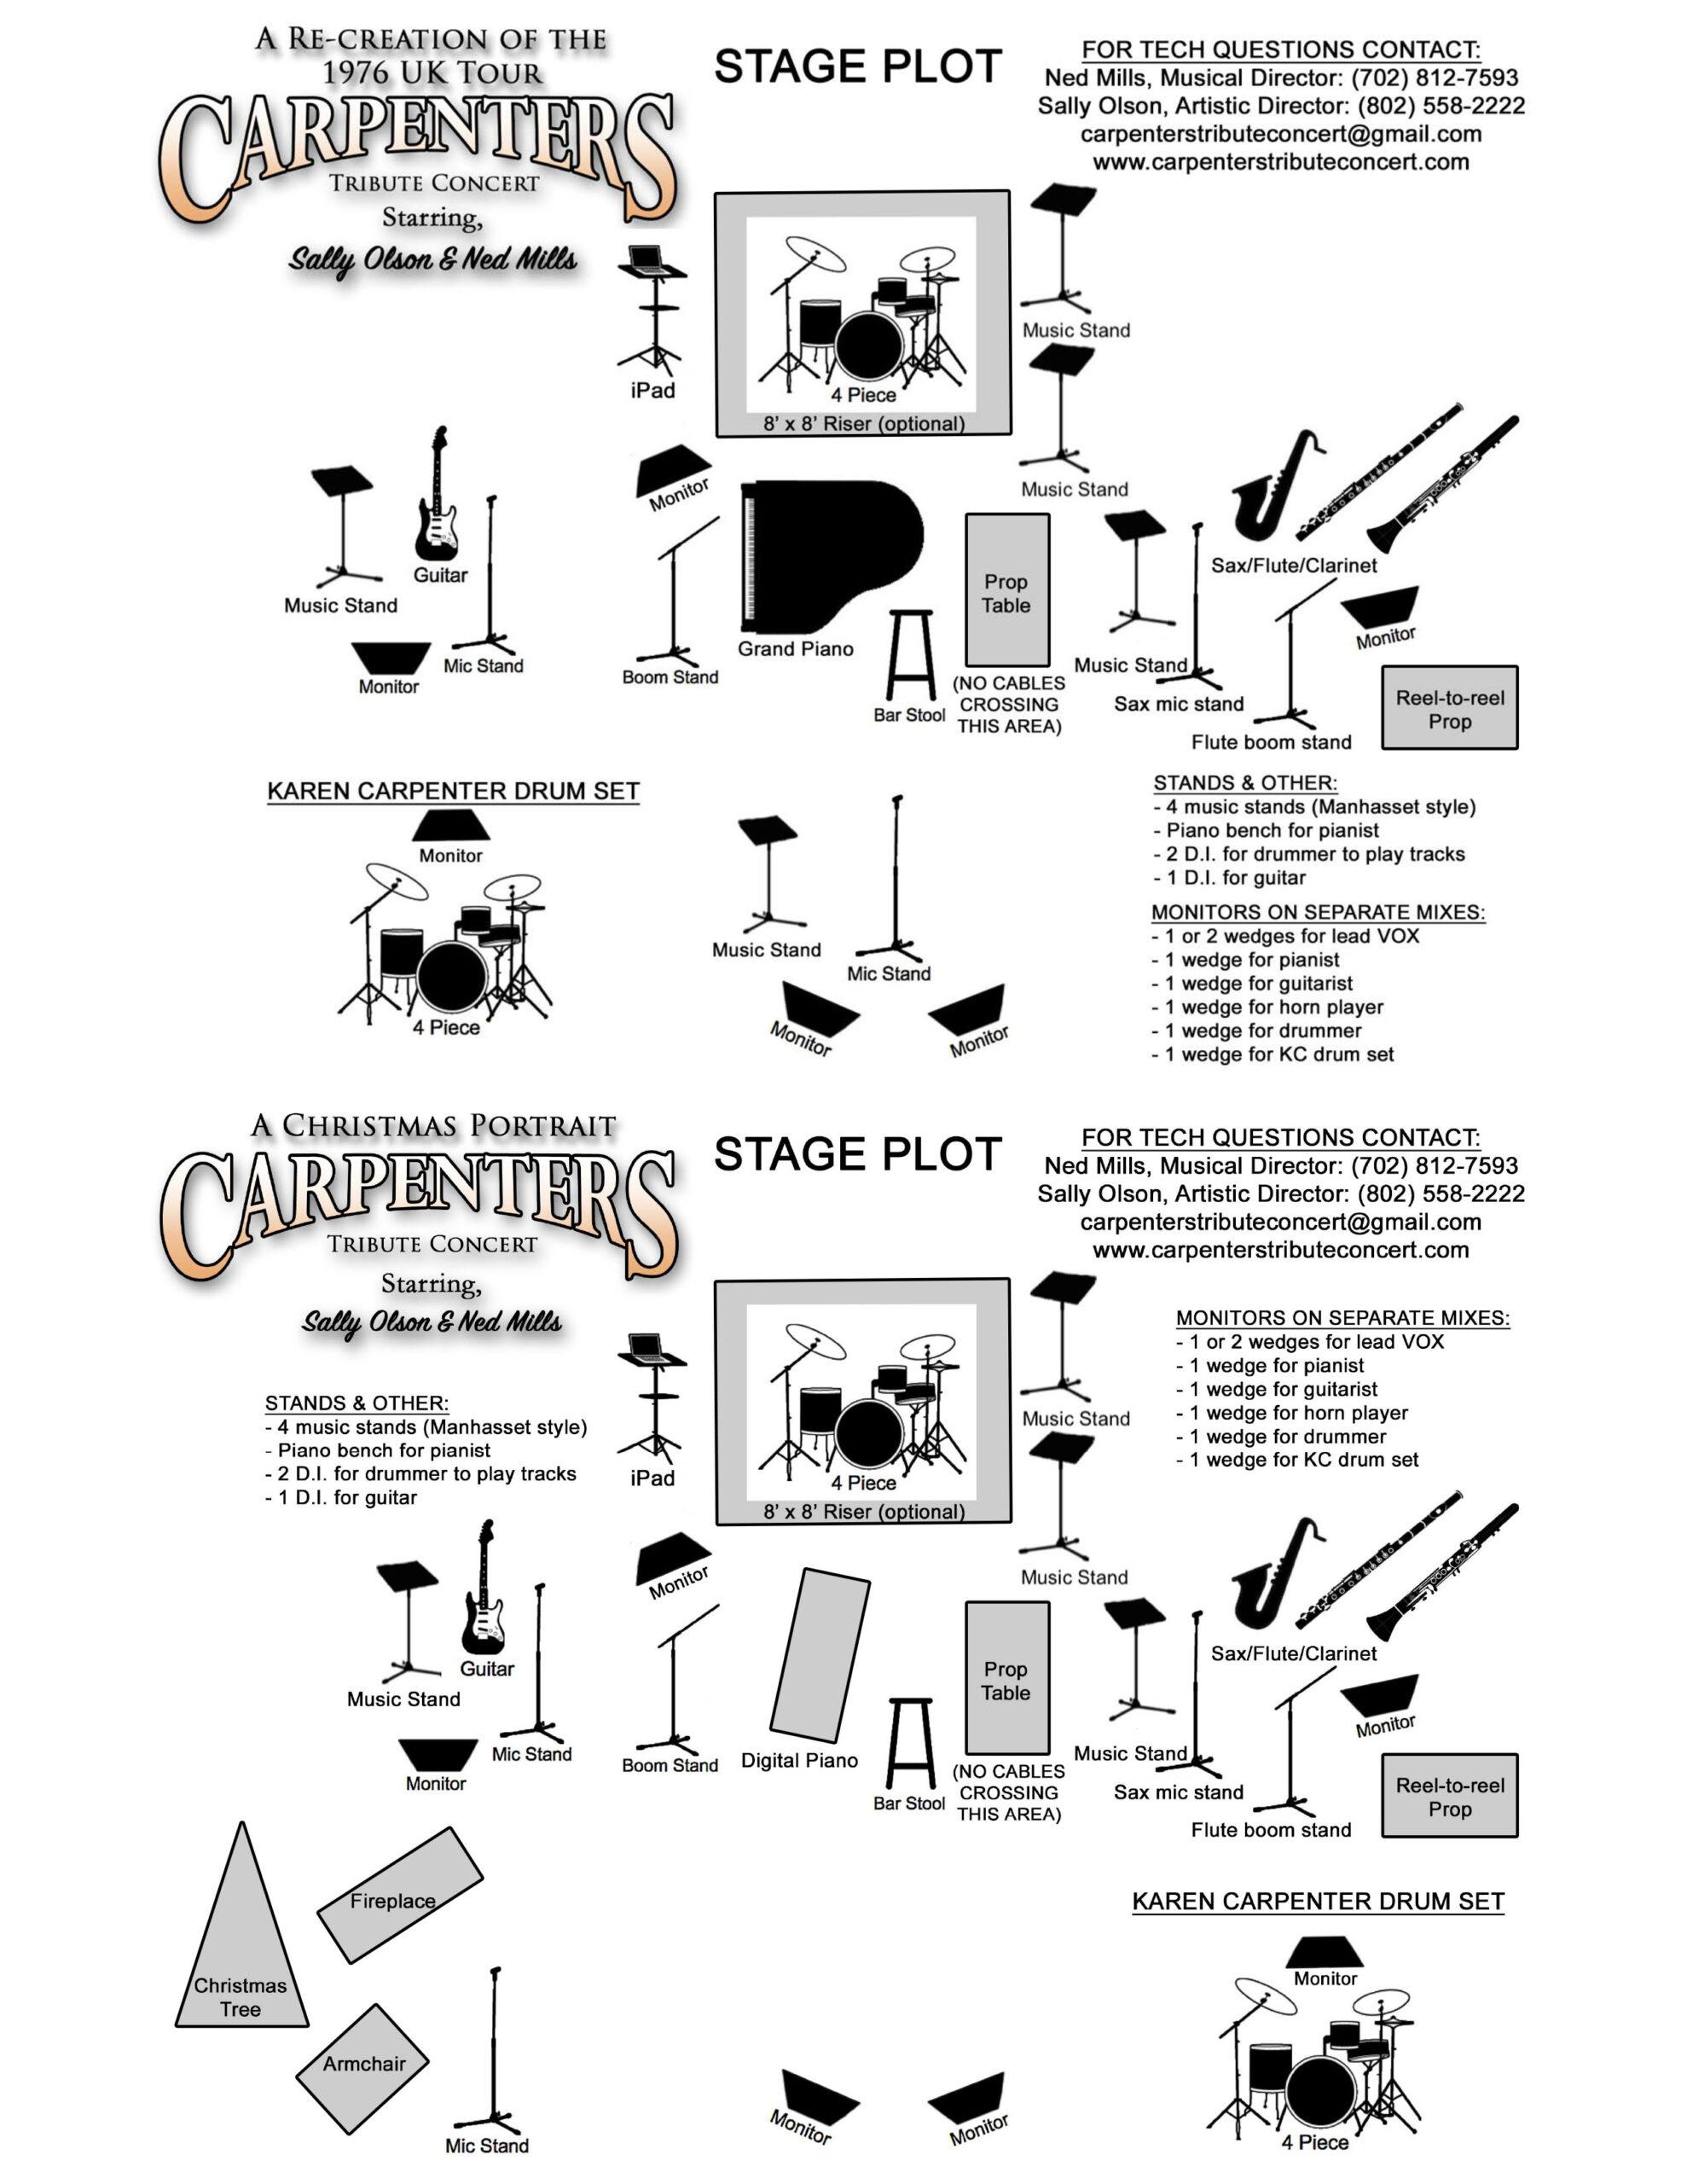 carpenters-tribute-stage-plot